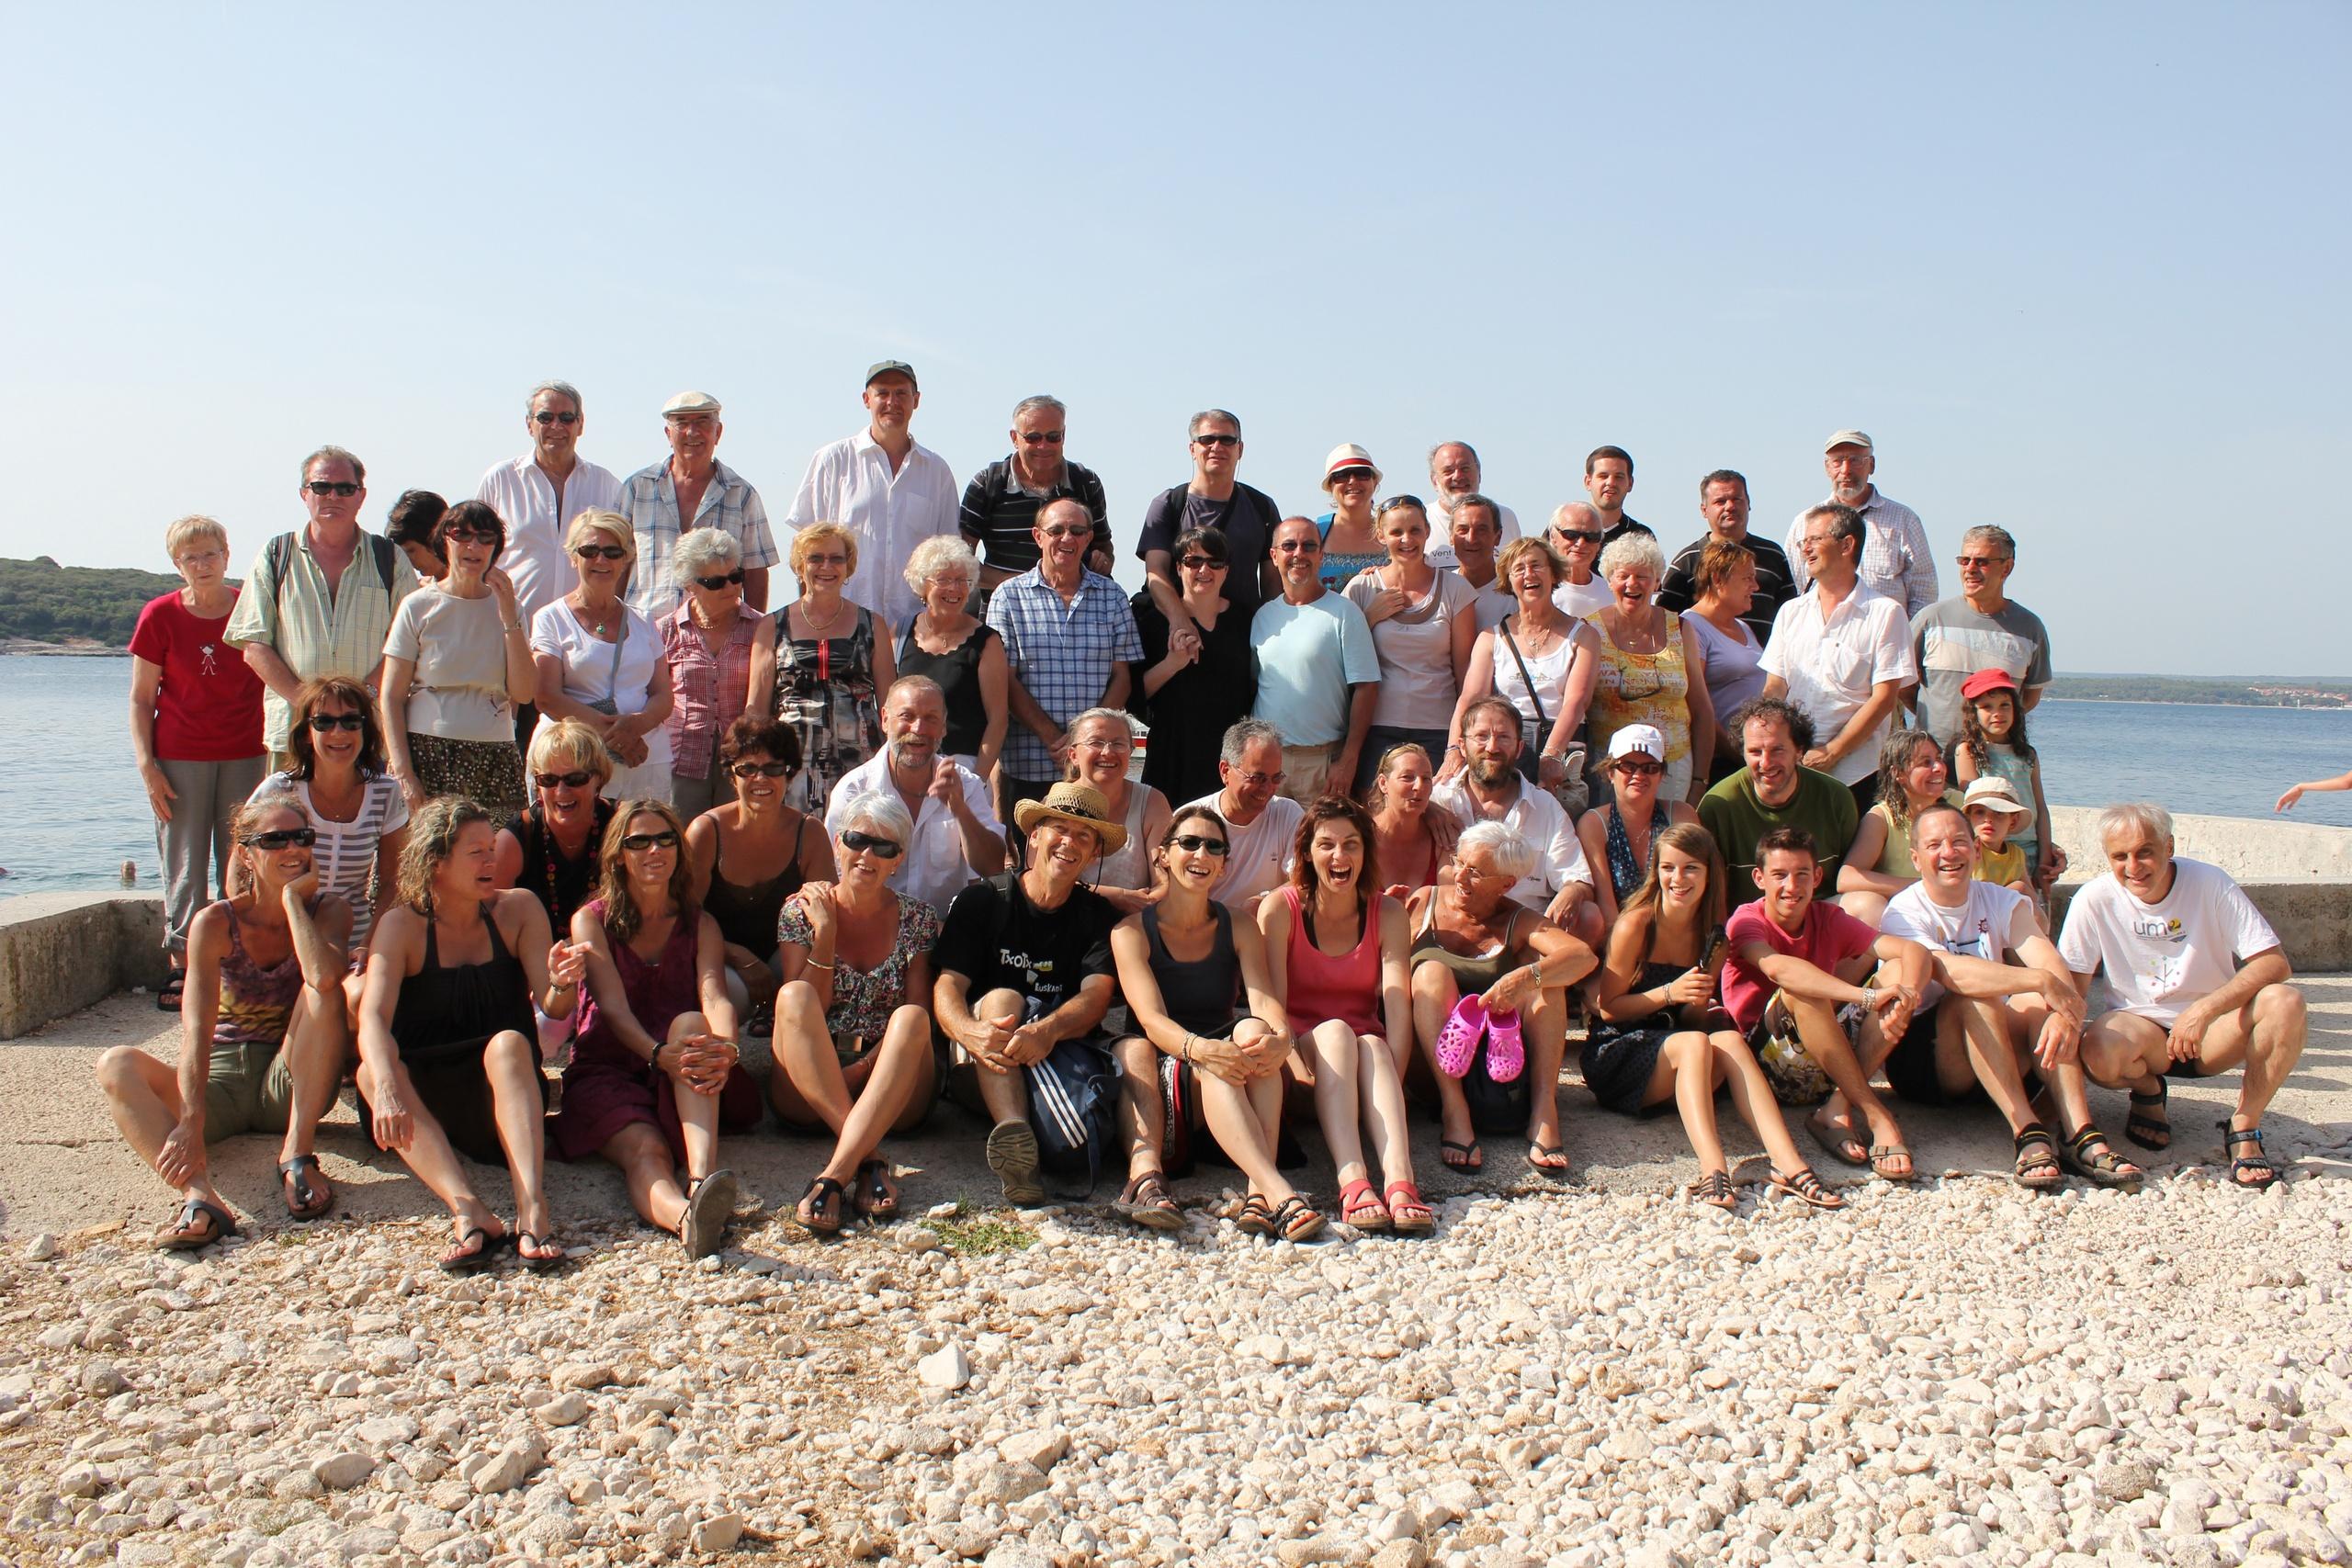 Le Groupe sur l'ile de Jerolim